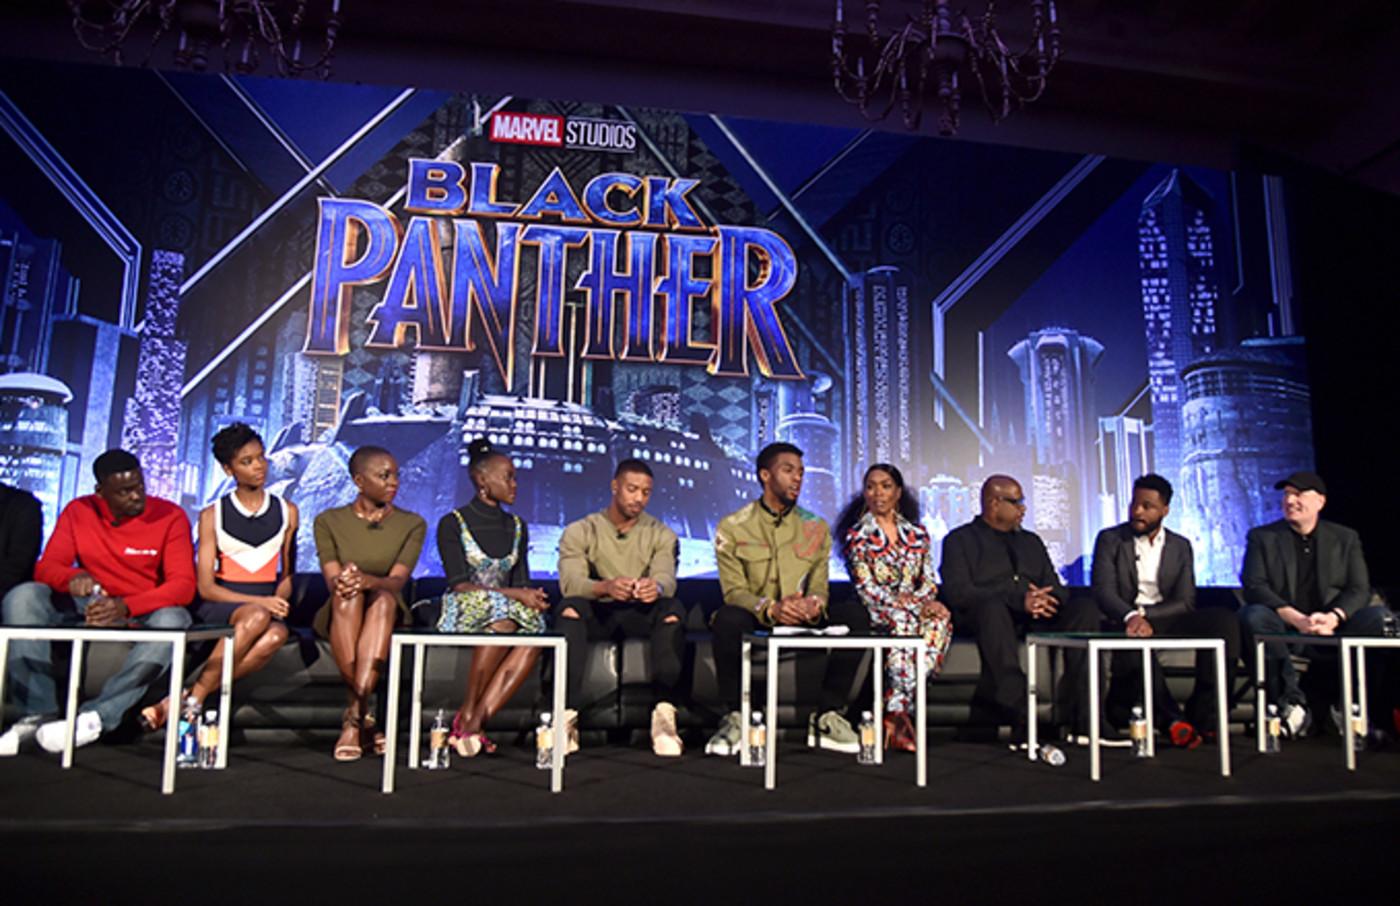 Black Panther cast.